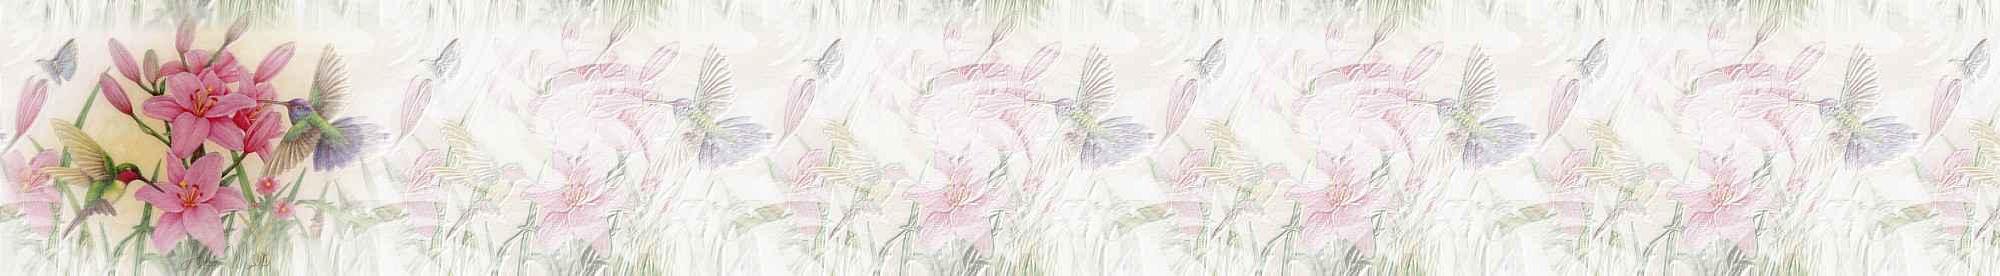 Fondo IM flores_018.imf